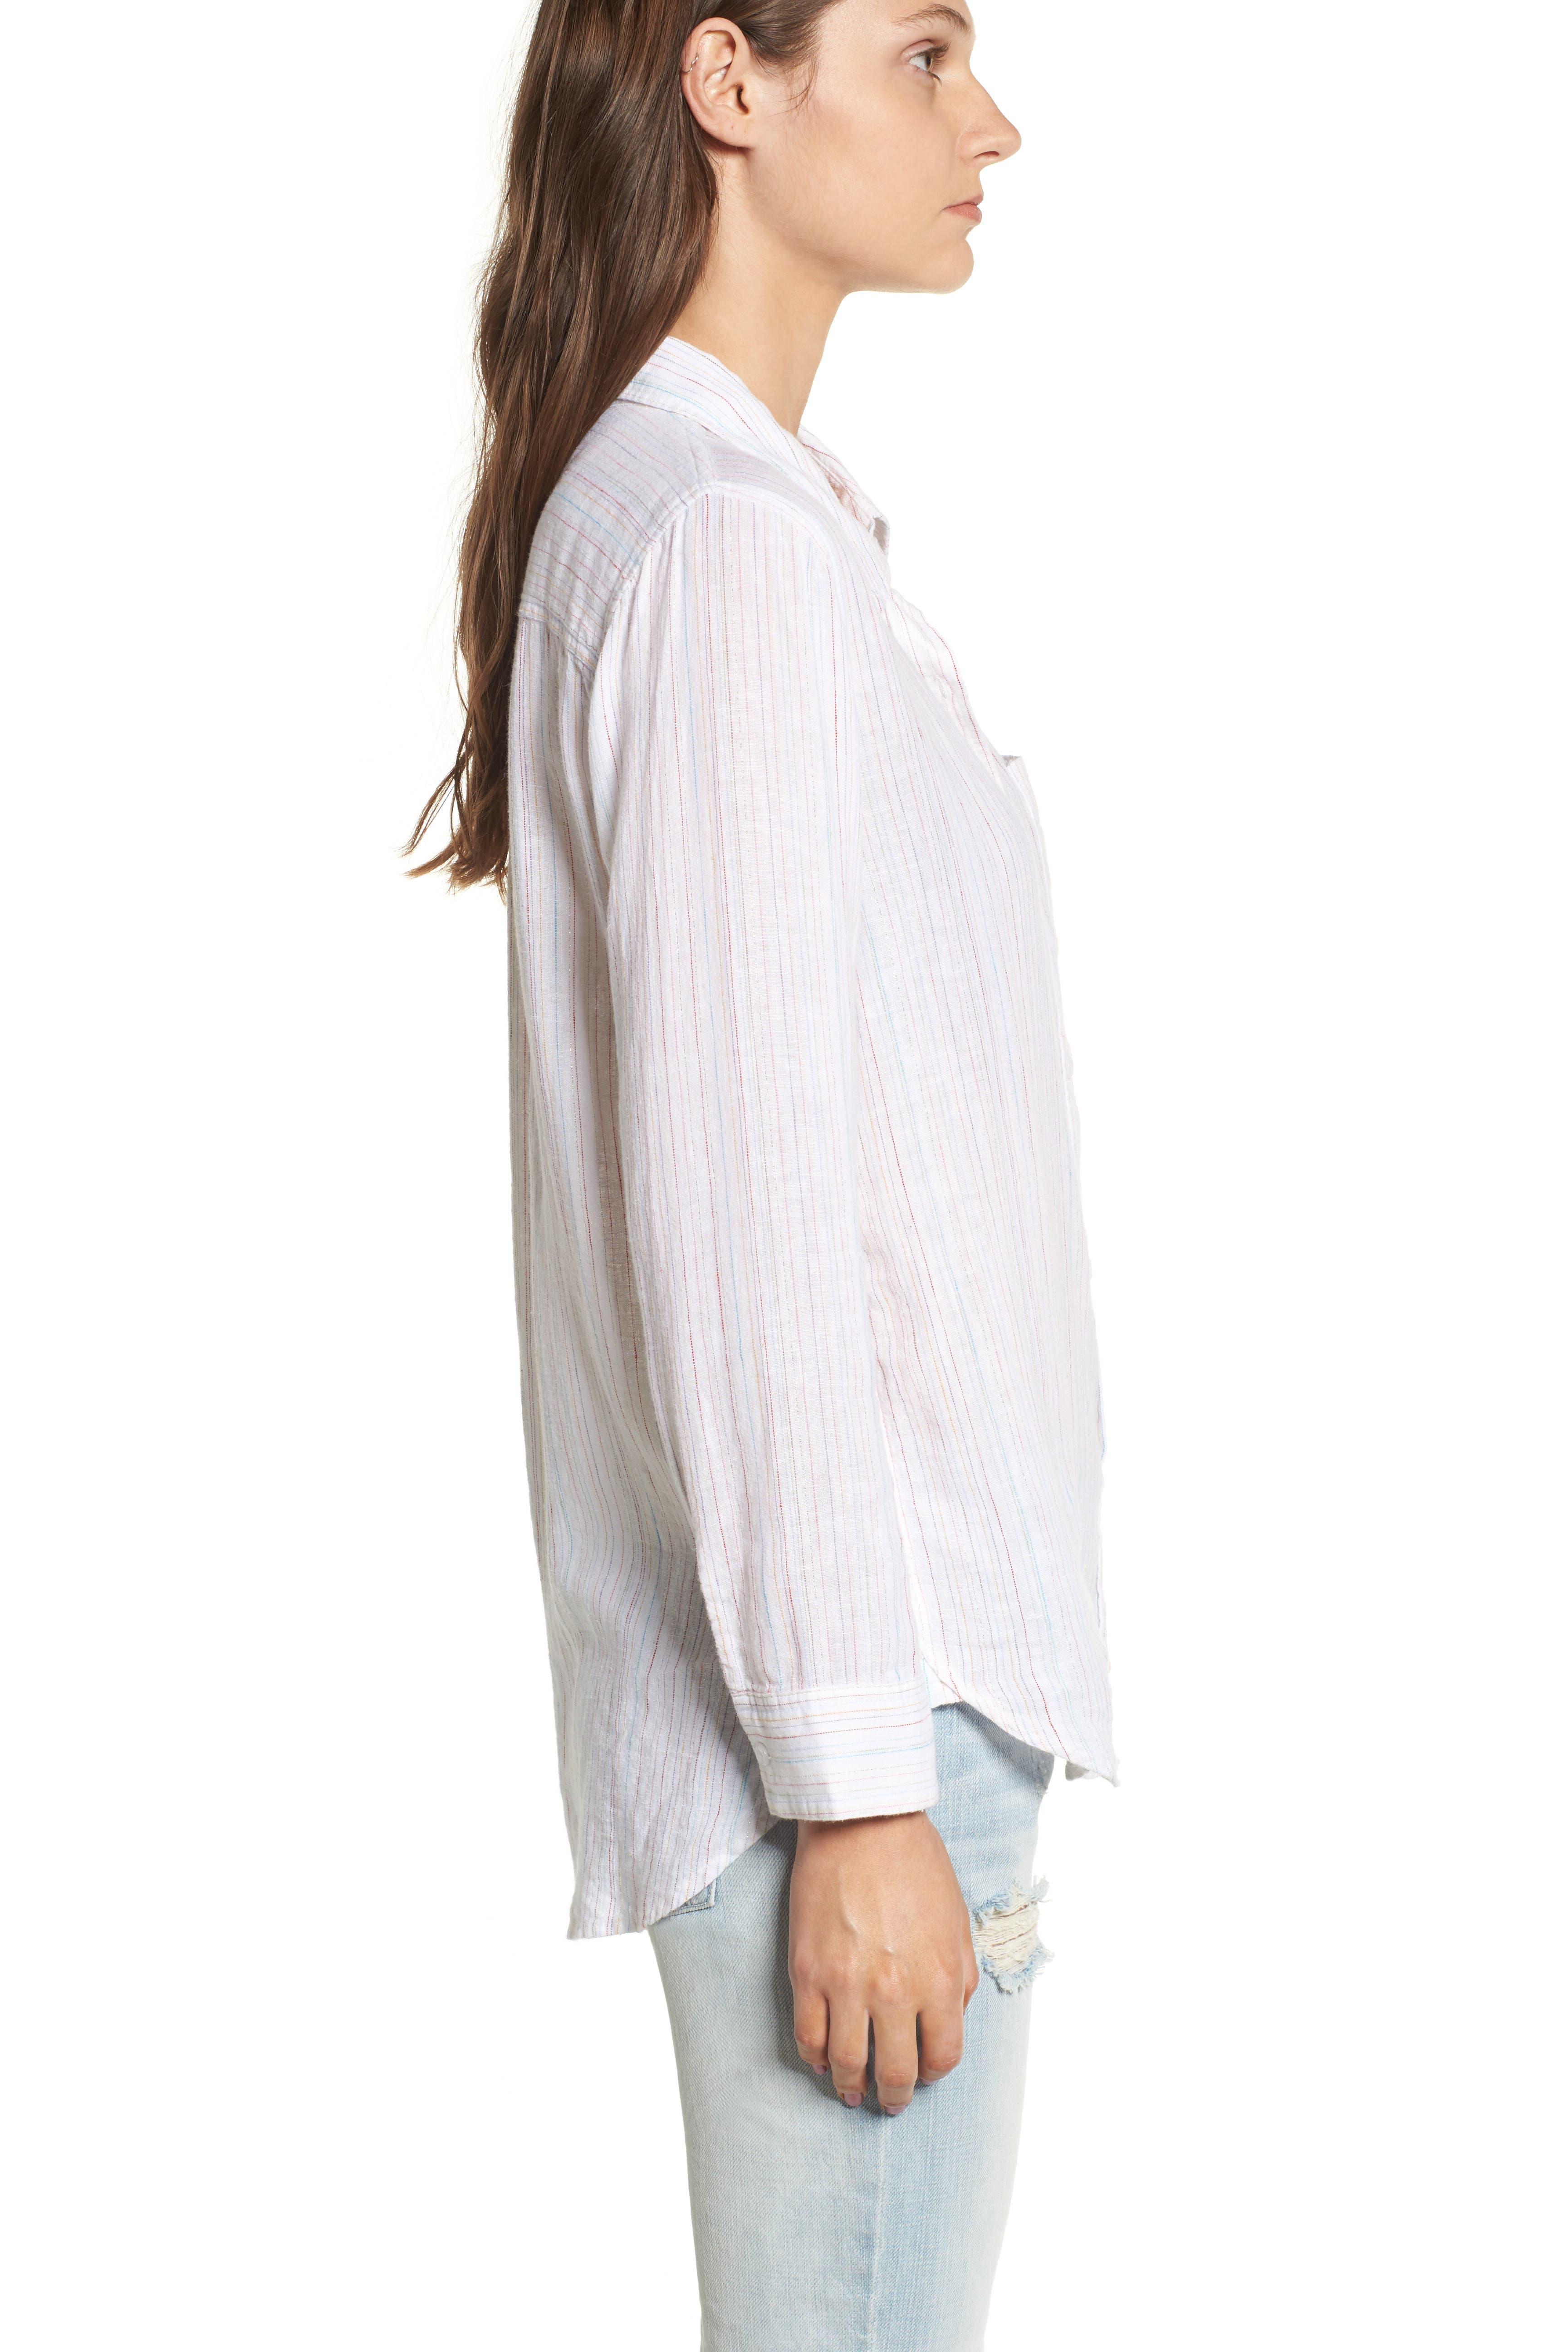 Taylor Heart Stripe Shirt,                             Alternate thumbnail 4, color,                             400